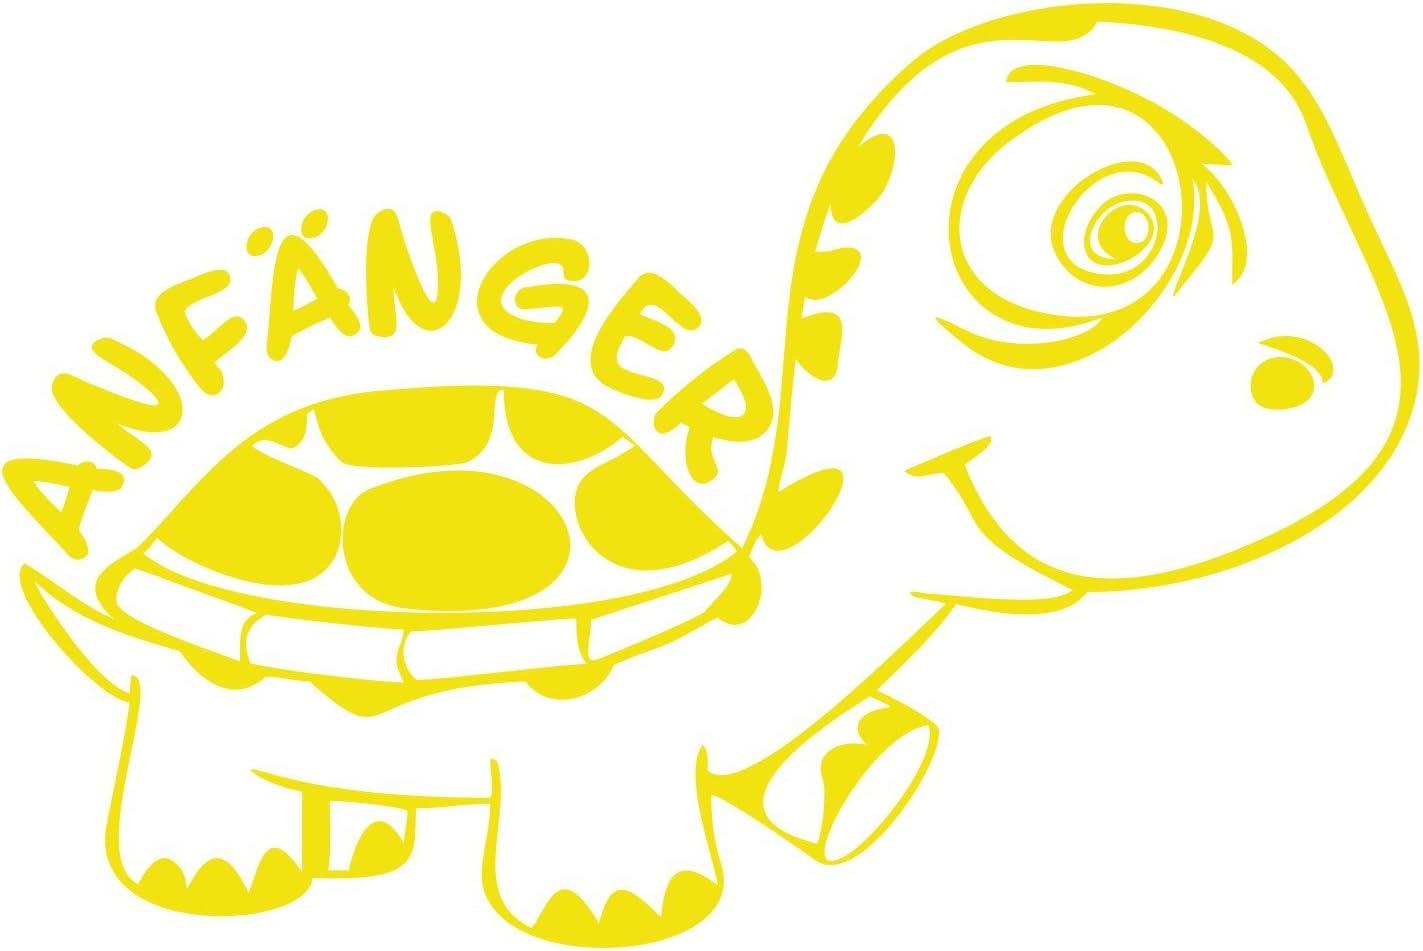 Folistick Anfänger Turtle Schildkröte Aufkleber Autotattoo Autoaufkleber Ausführung Rechts Schwefelgelb Auto